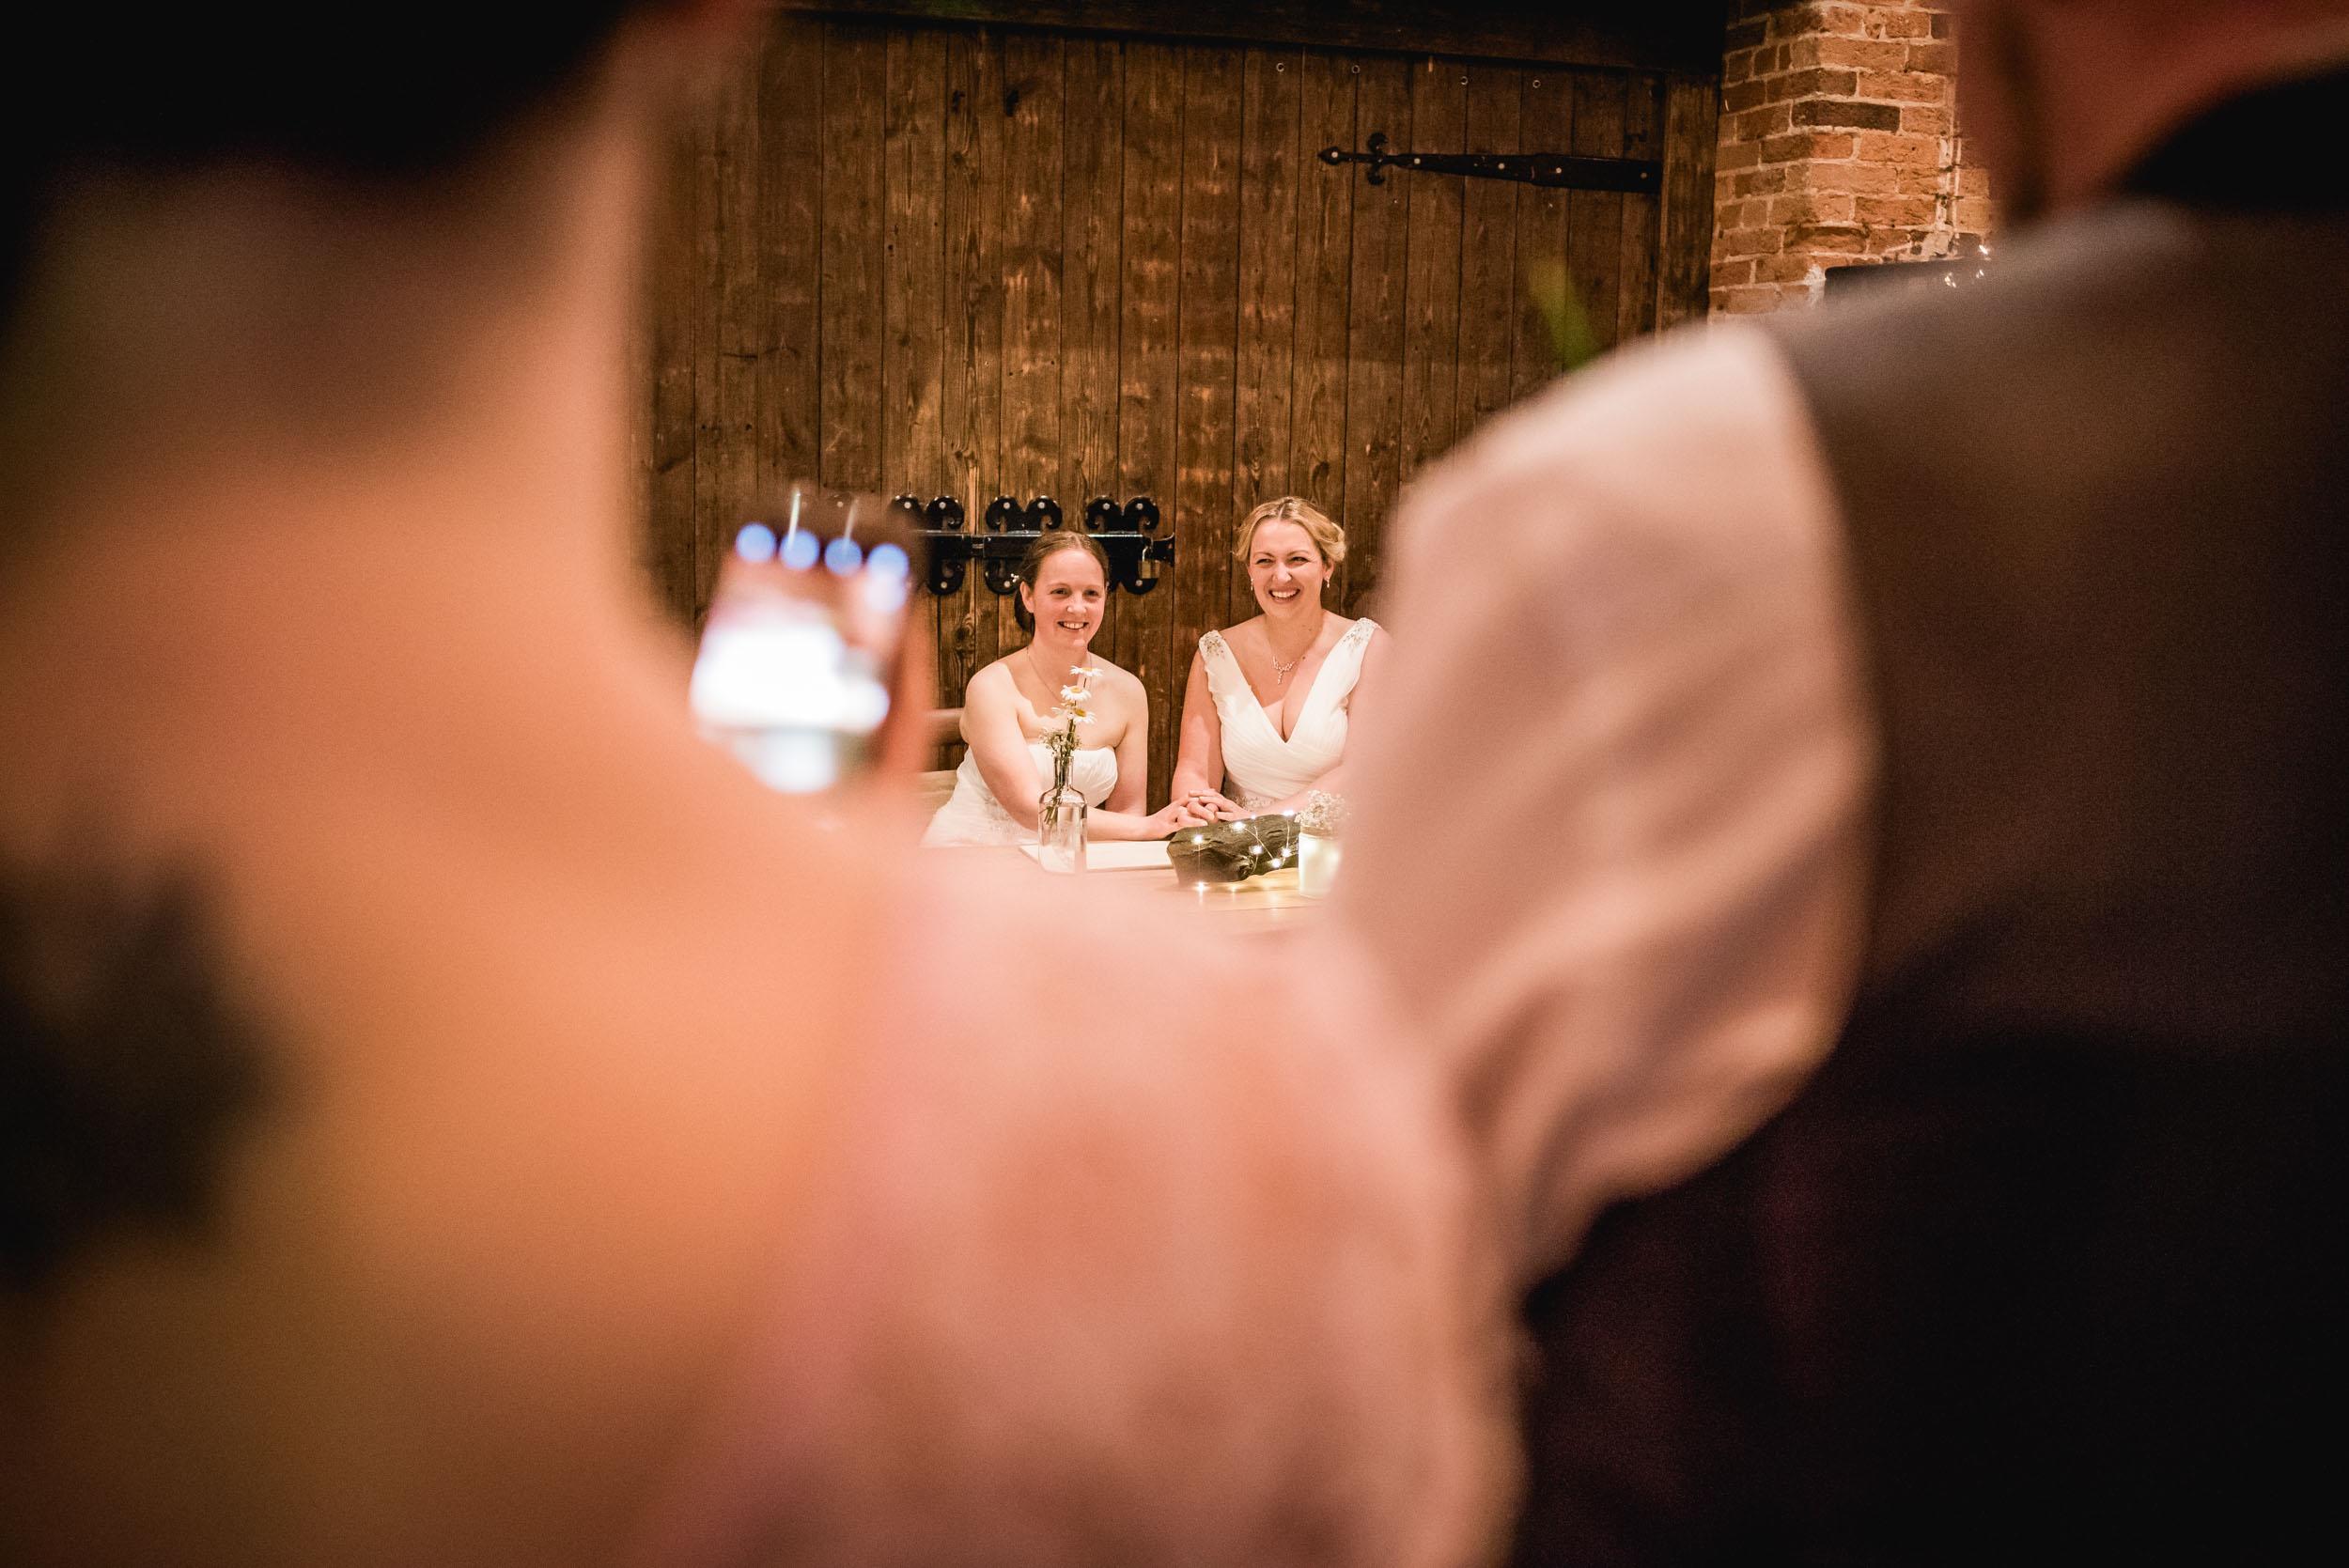 Donington-park-farm-wedding-photography-202.jpg